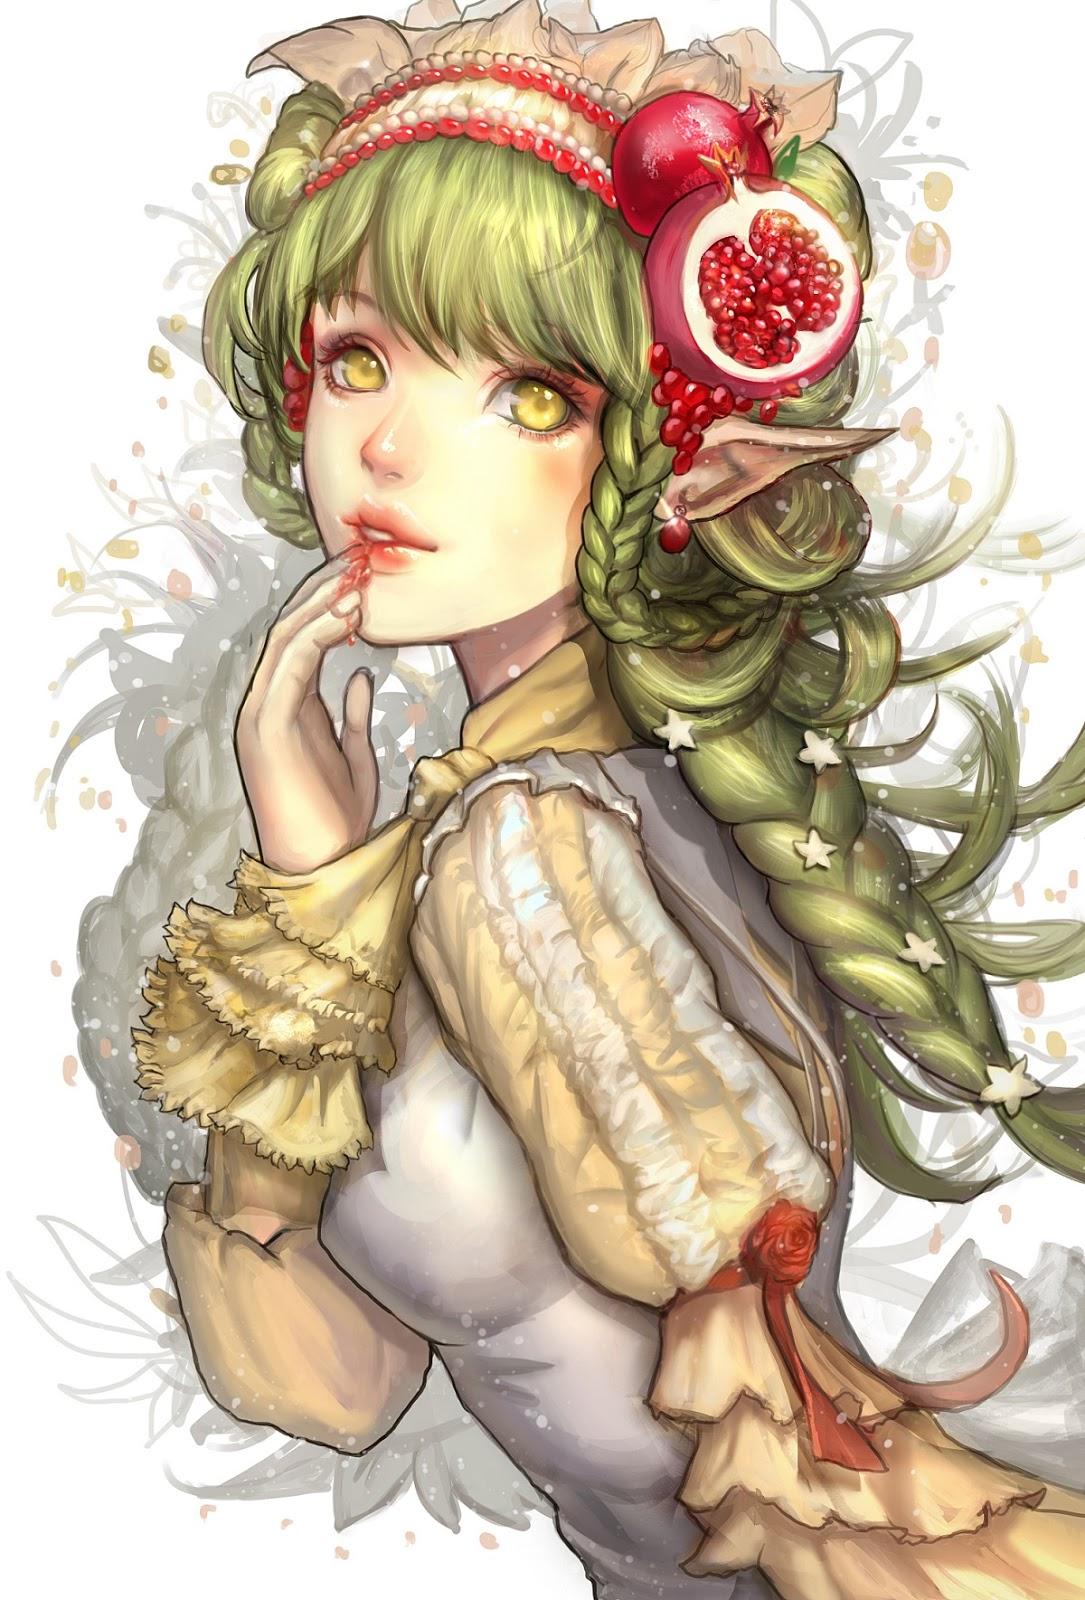 Digital Art/Illustrations by Sangrde